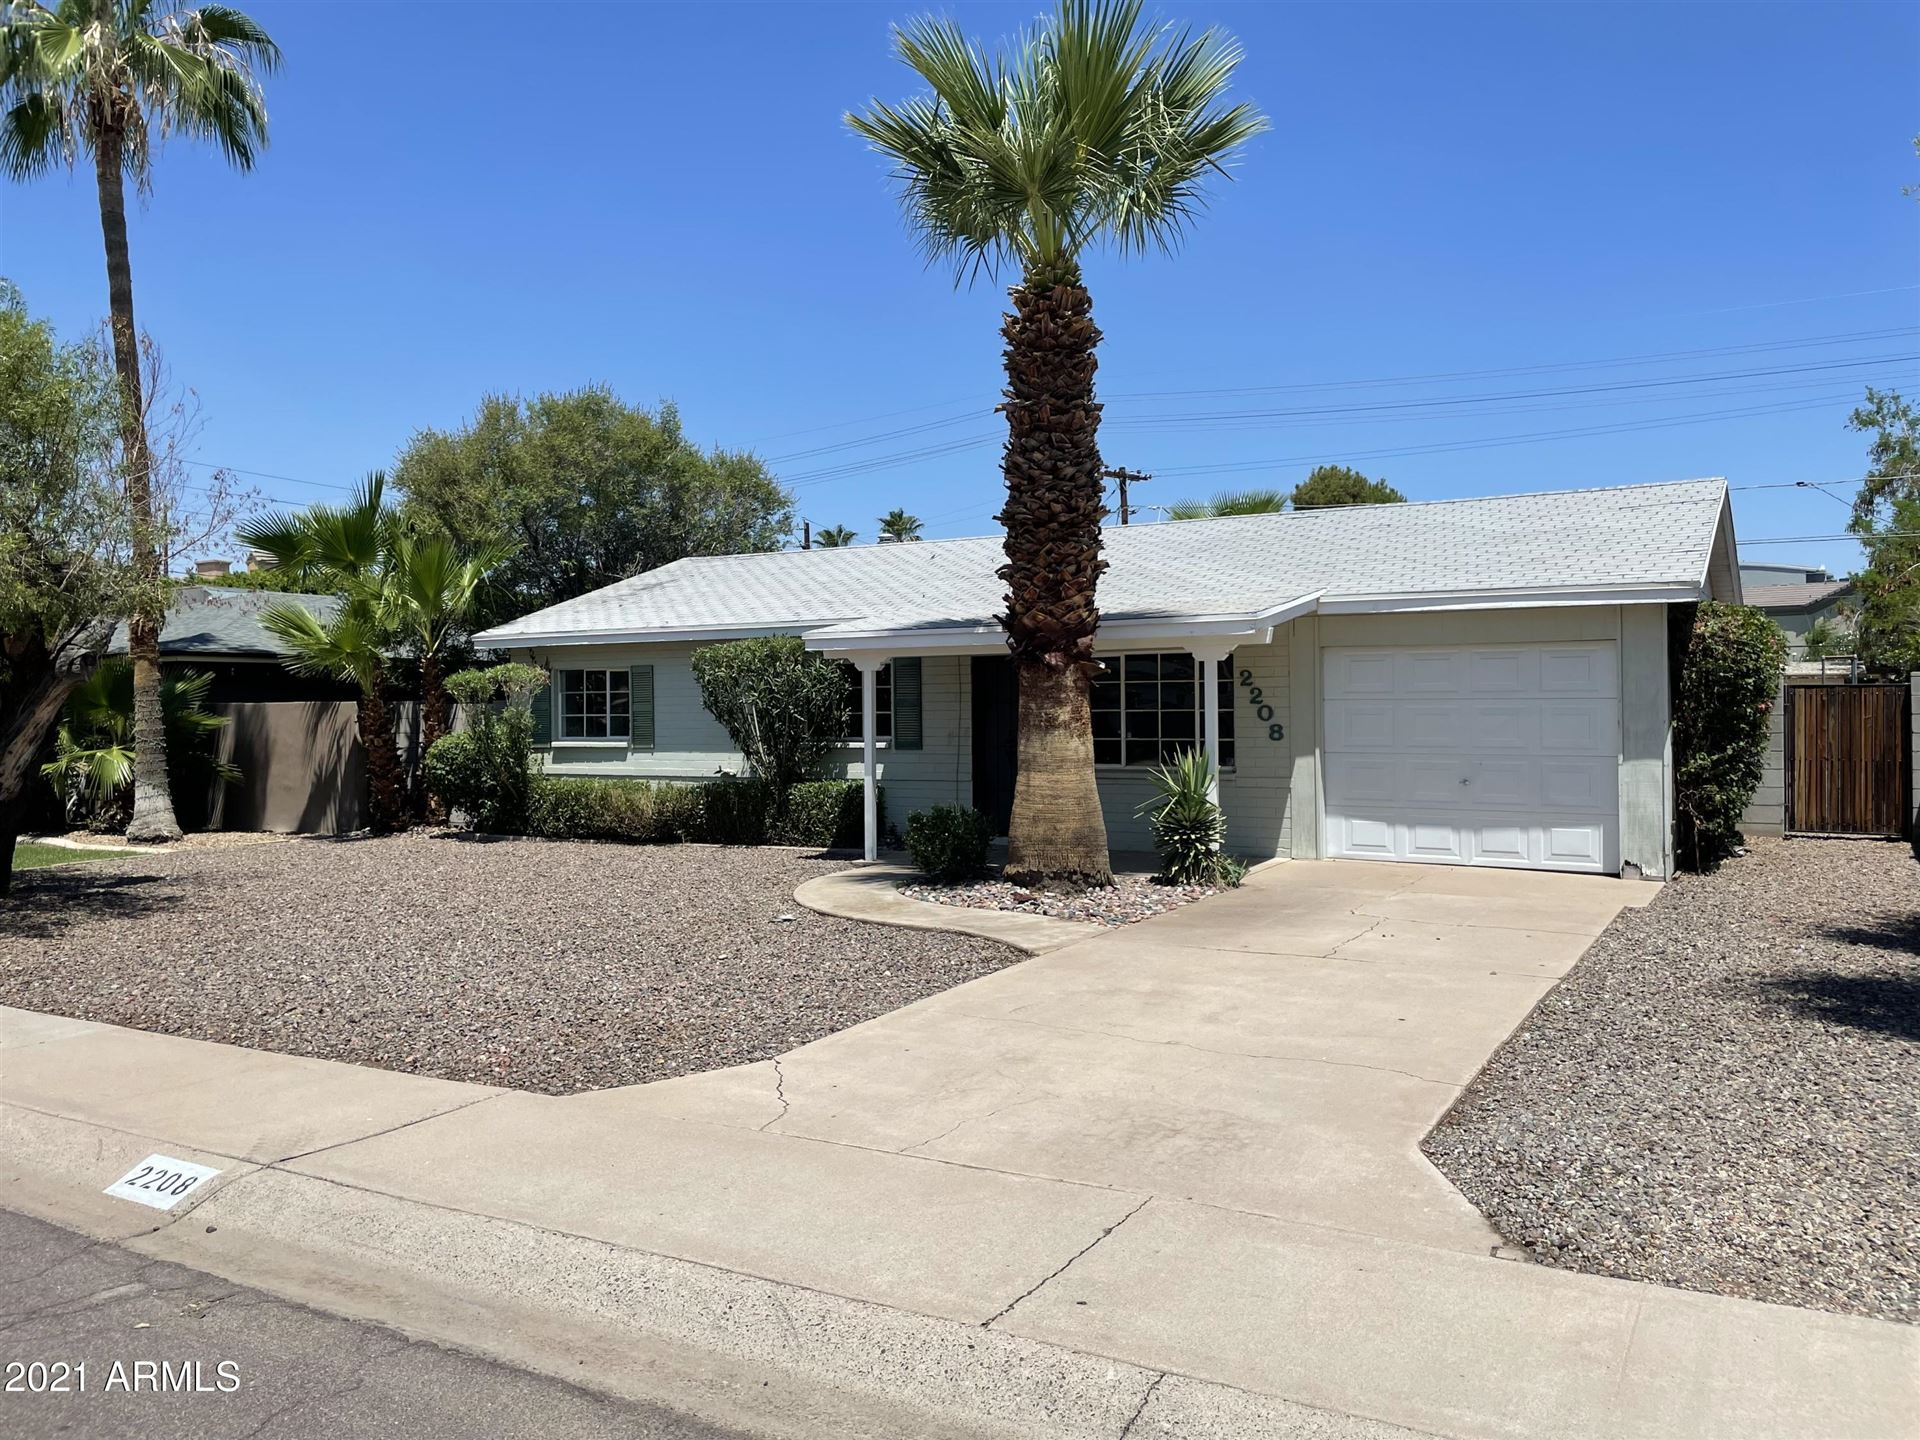 2208 E SELLS Drive, Phoenix, AZ 85016 - MLS#: 6271452